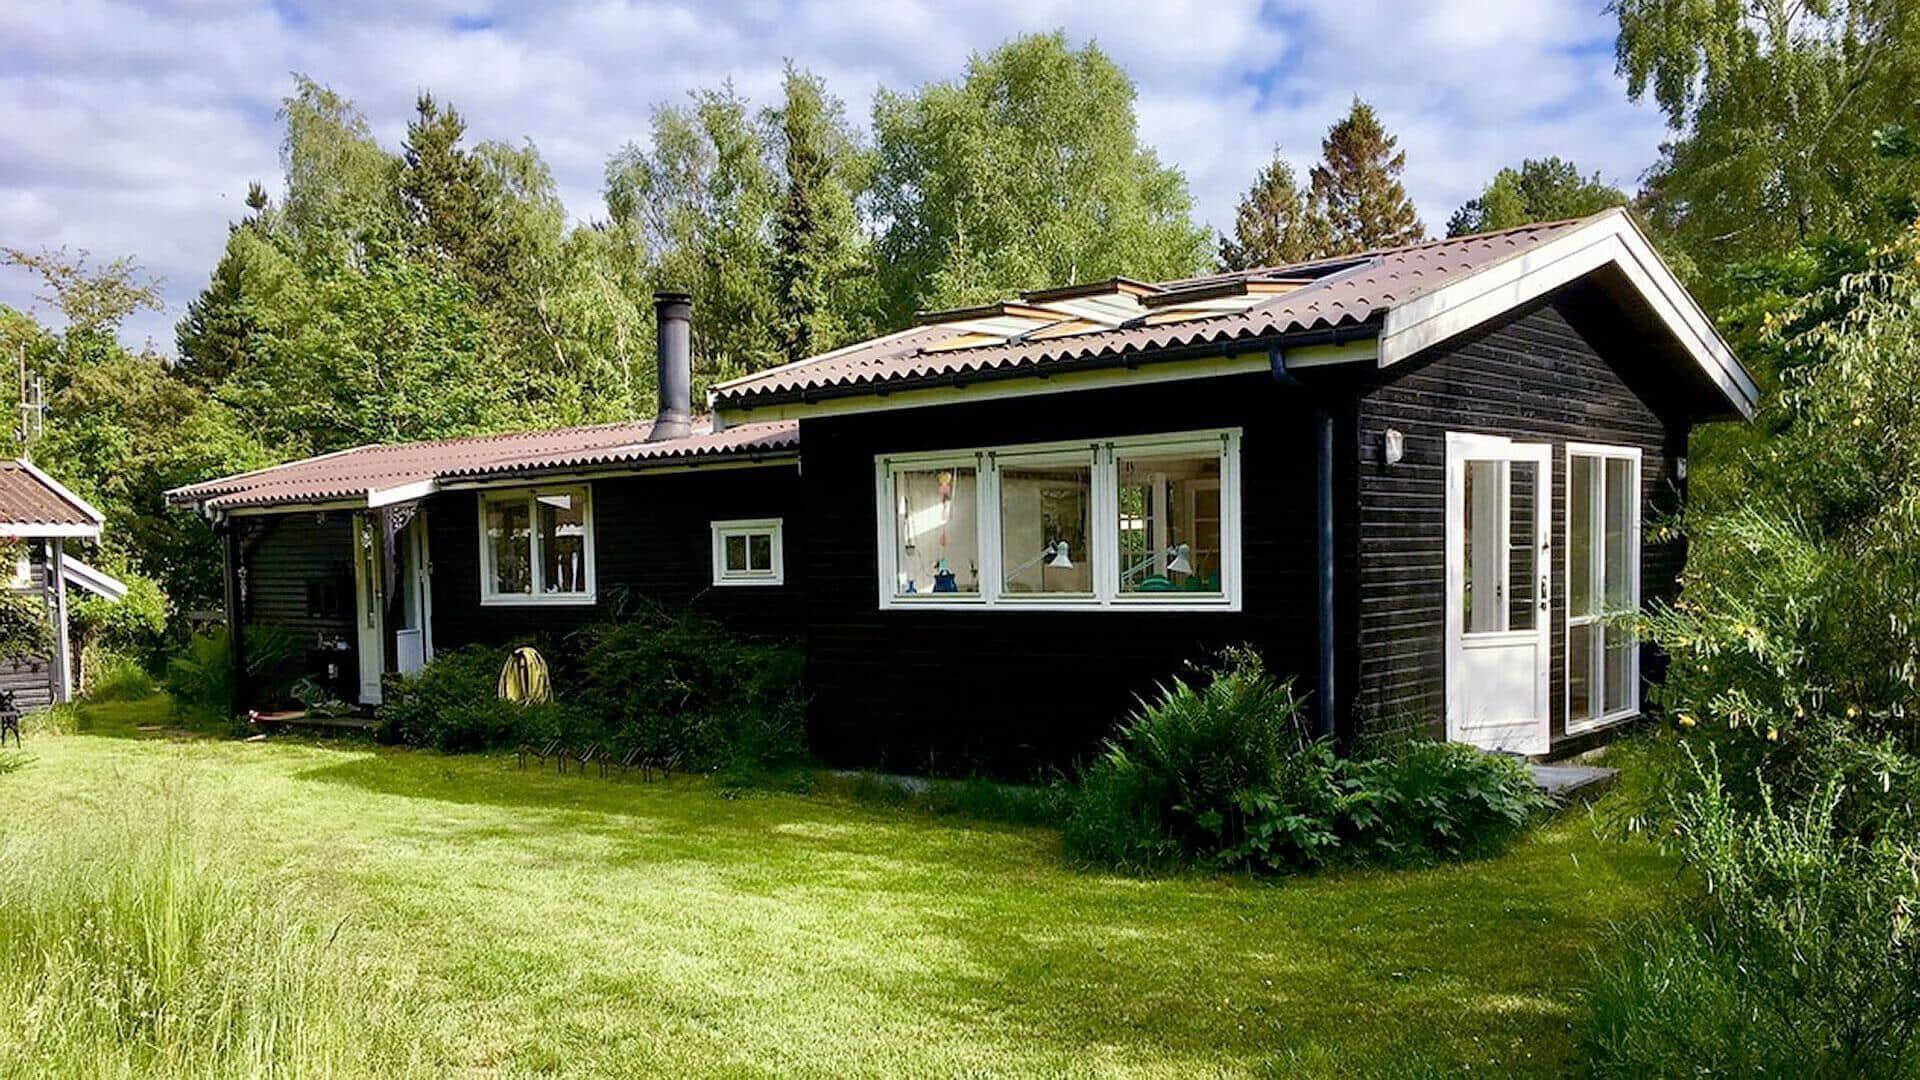 Bild 1-17 Ferienhaus 12255, Klokkelyngvej 5, DK - 4583 Sjællands Odde